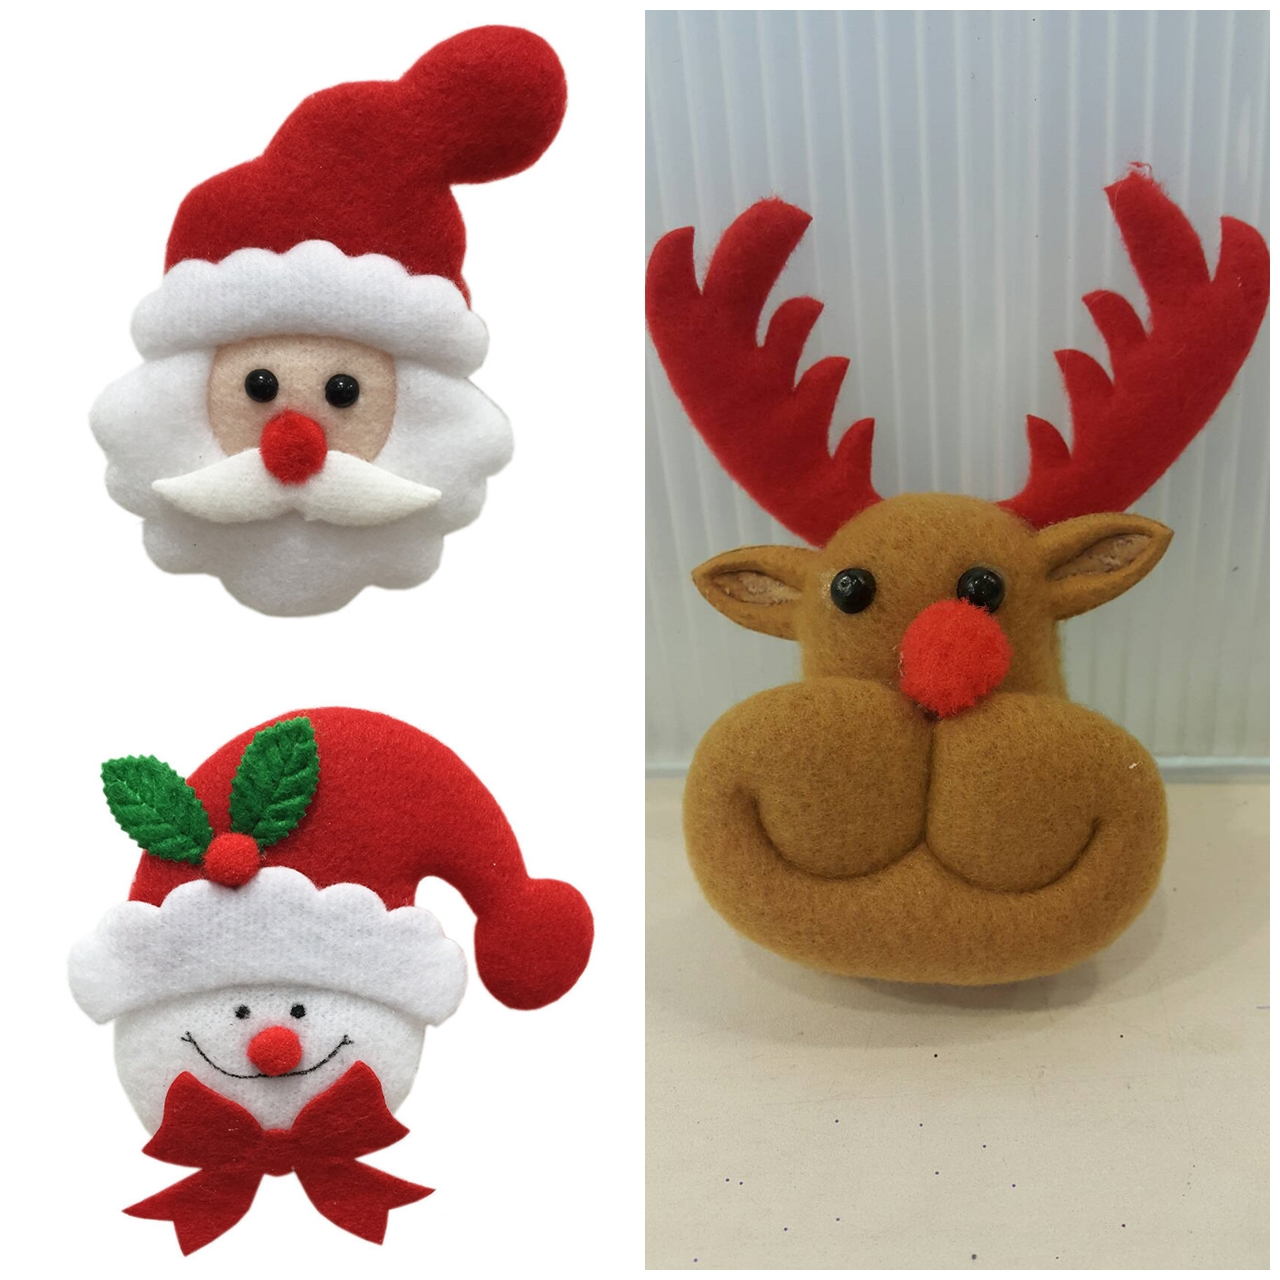 X射線【X293573】閃燈聖誕公仔胸針,聖誕節/交換禮物/掛飾/裝飾/DIY/材料包/徽章/別針